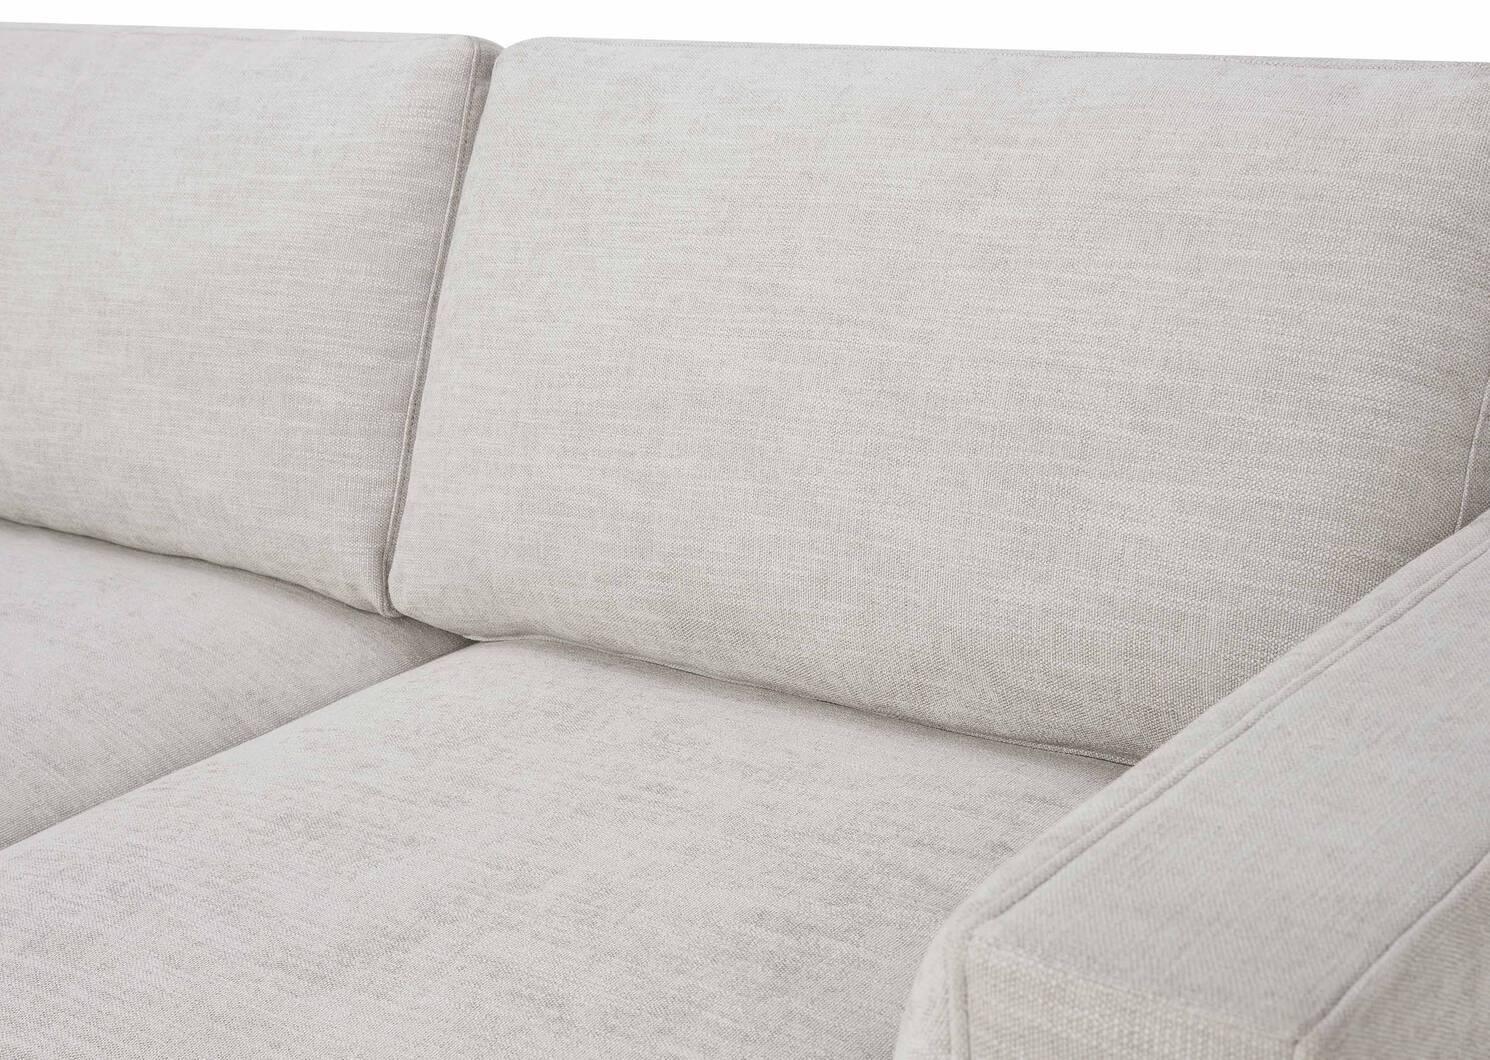 Canapé d'angle Sonoma -Marley colombe